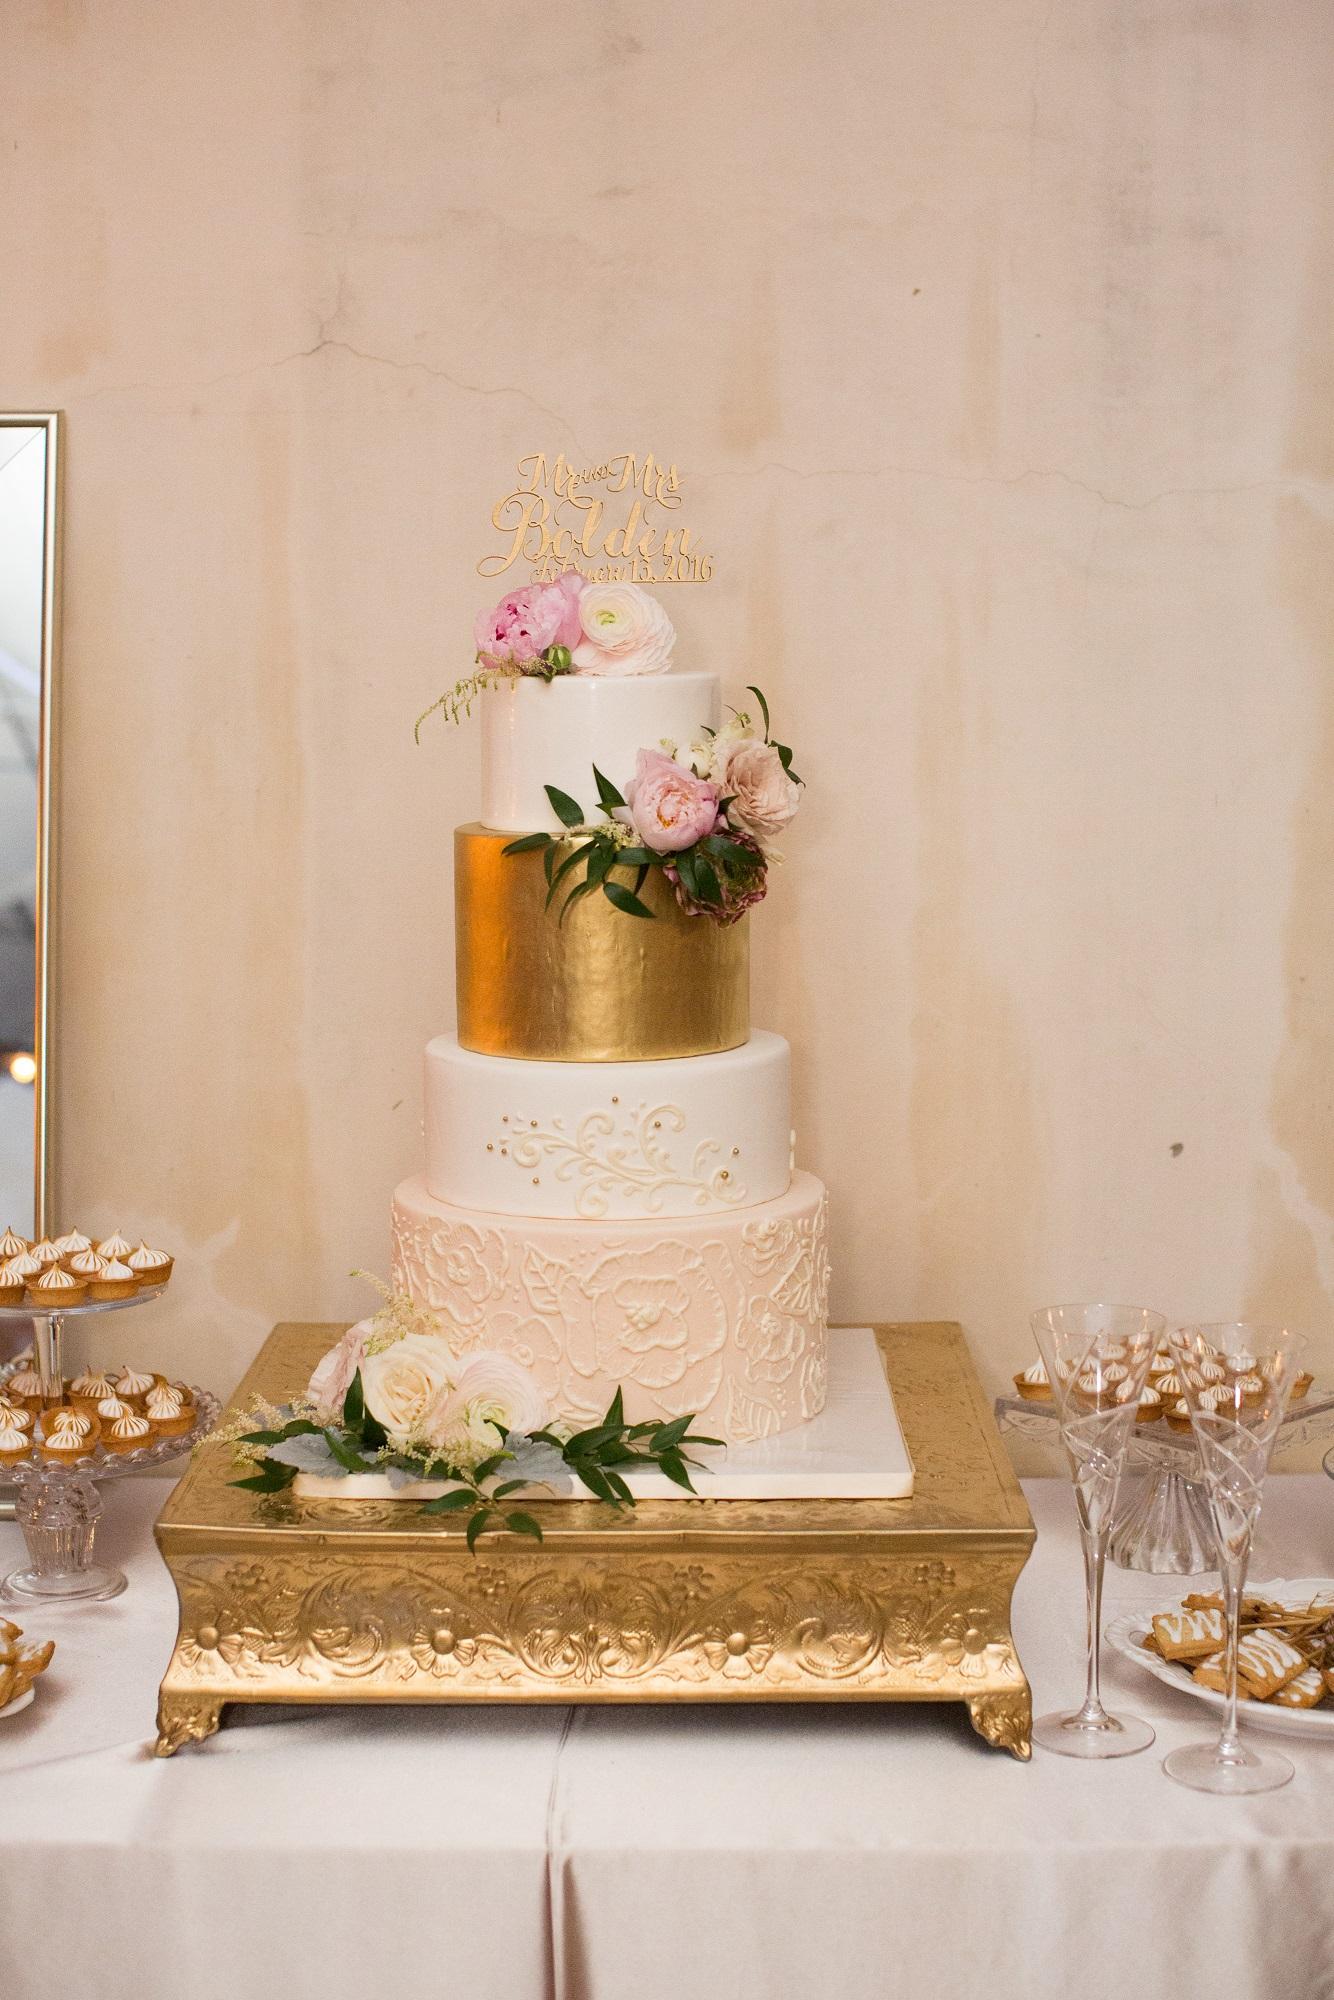 gold-blush-ivory-wedding-cake-sweet-cheeks-baking-co-found-creative-studio-photo